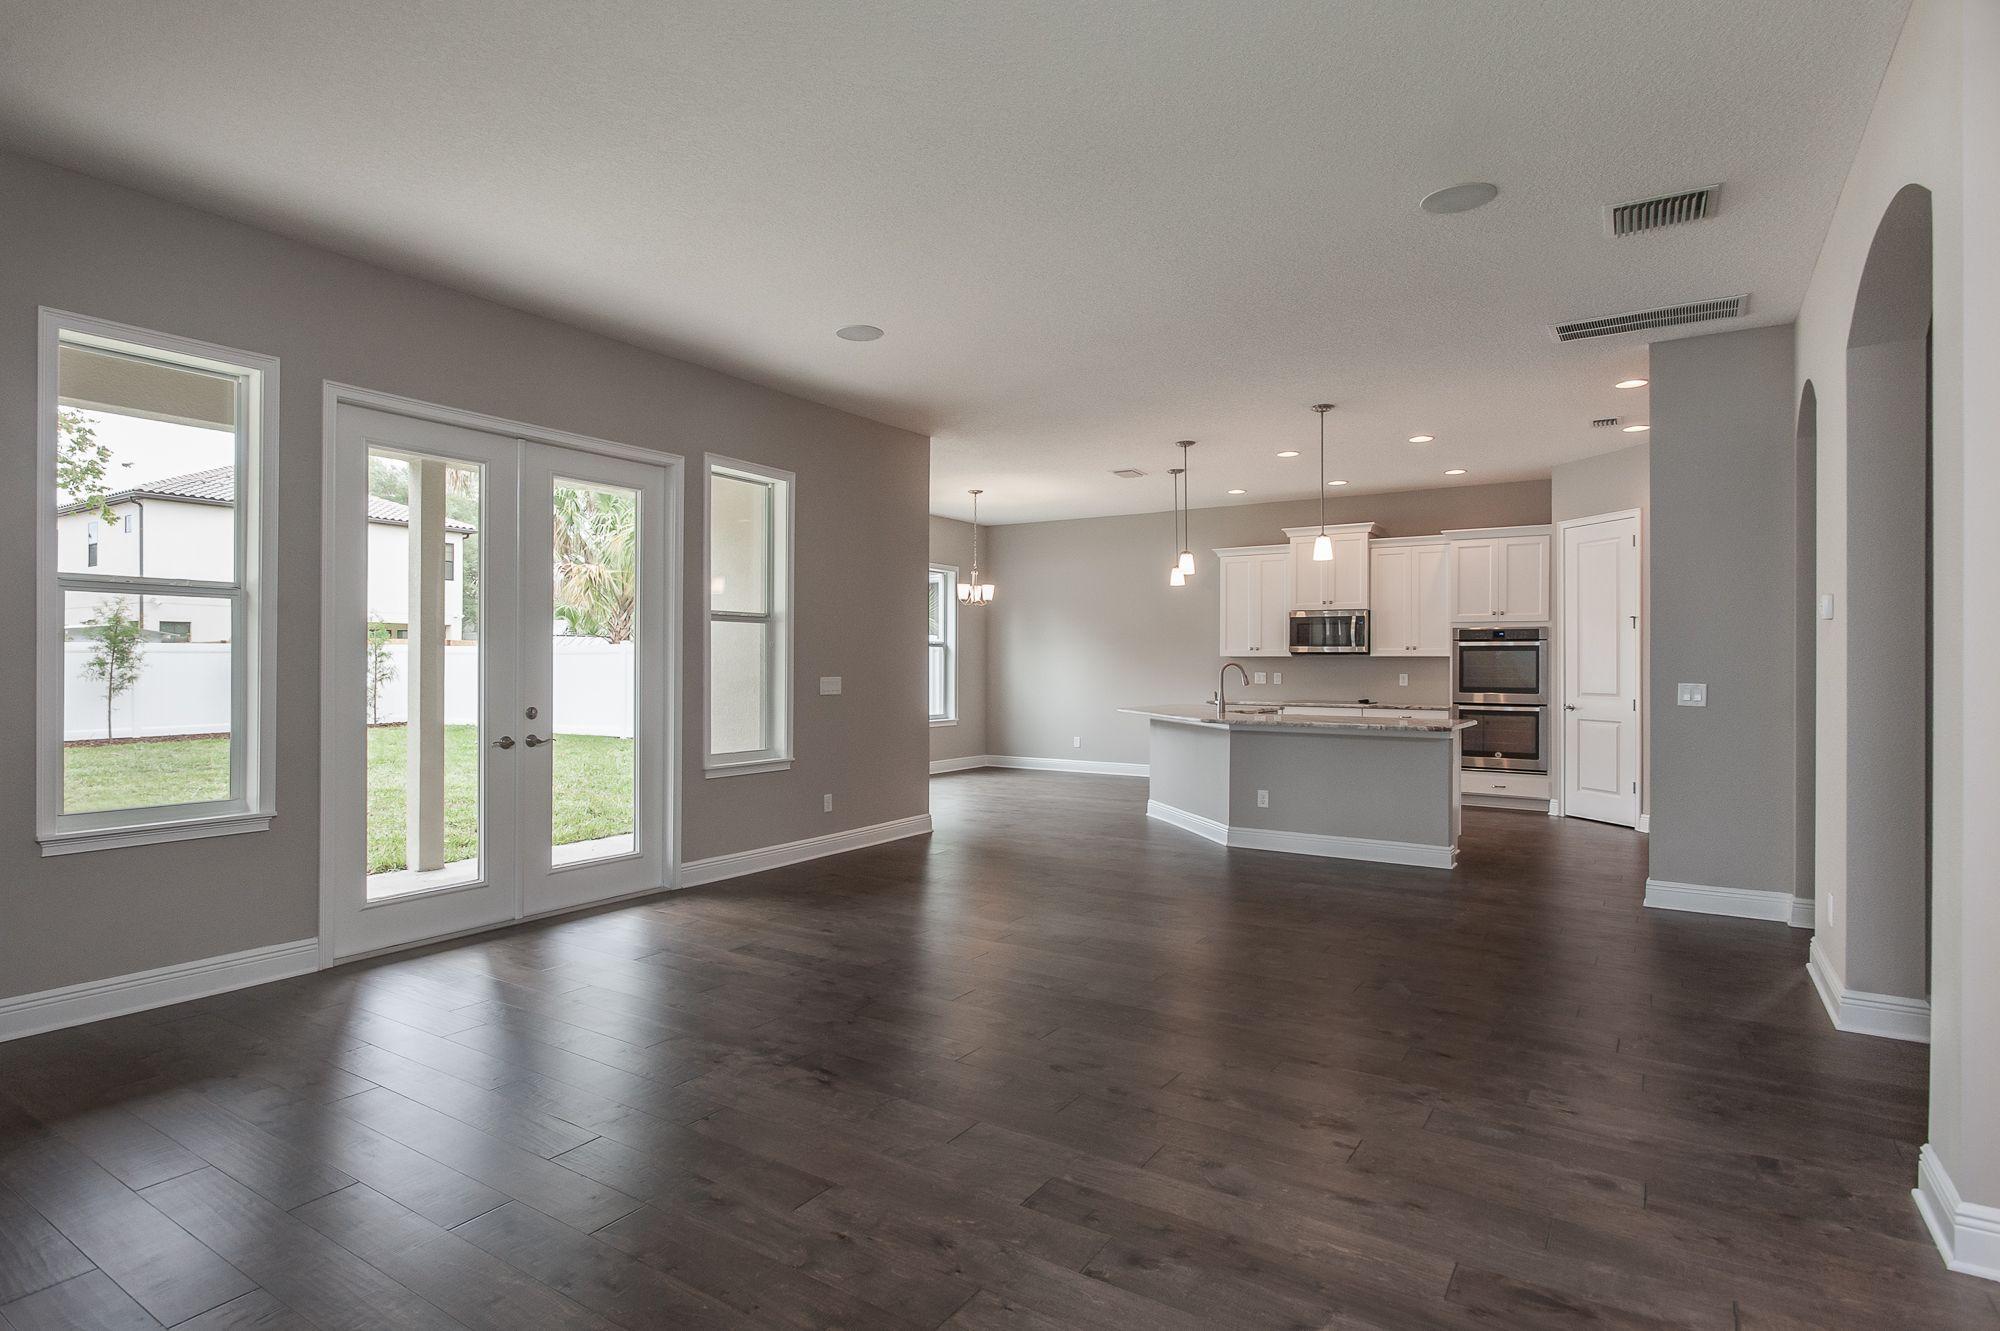 Best Sherwin Williams Collonade Gray Grey Walls Living Room 400 x 300